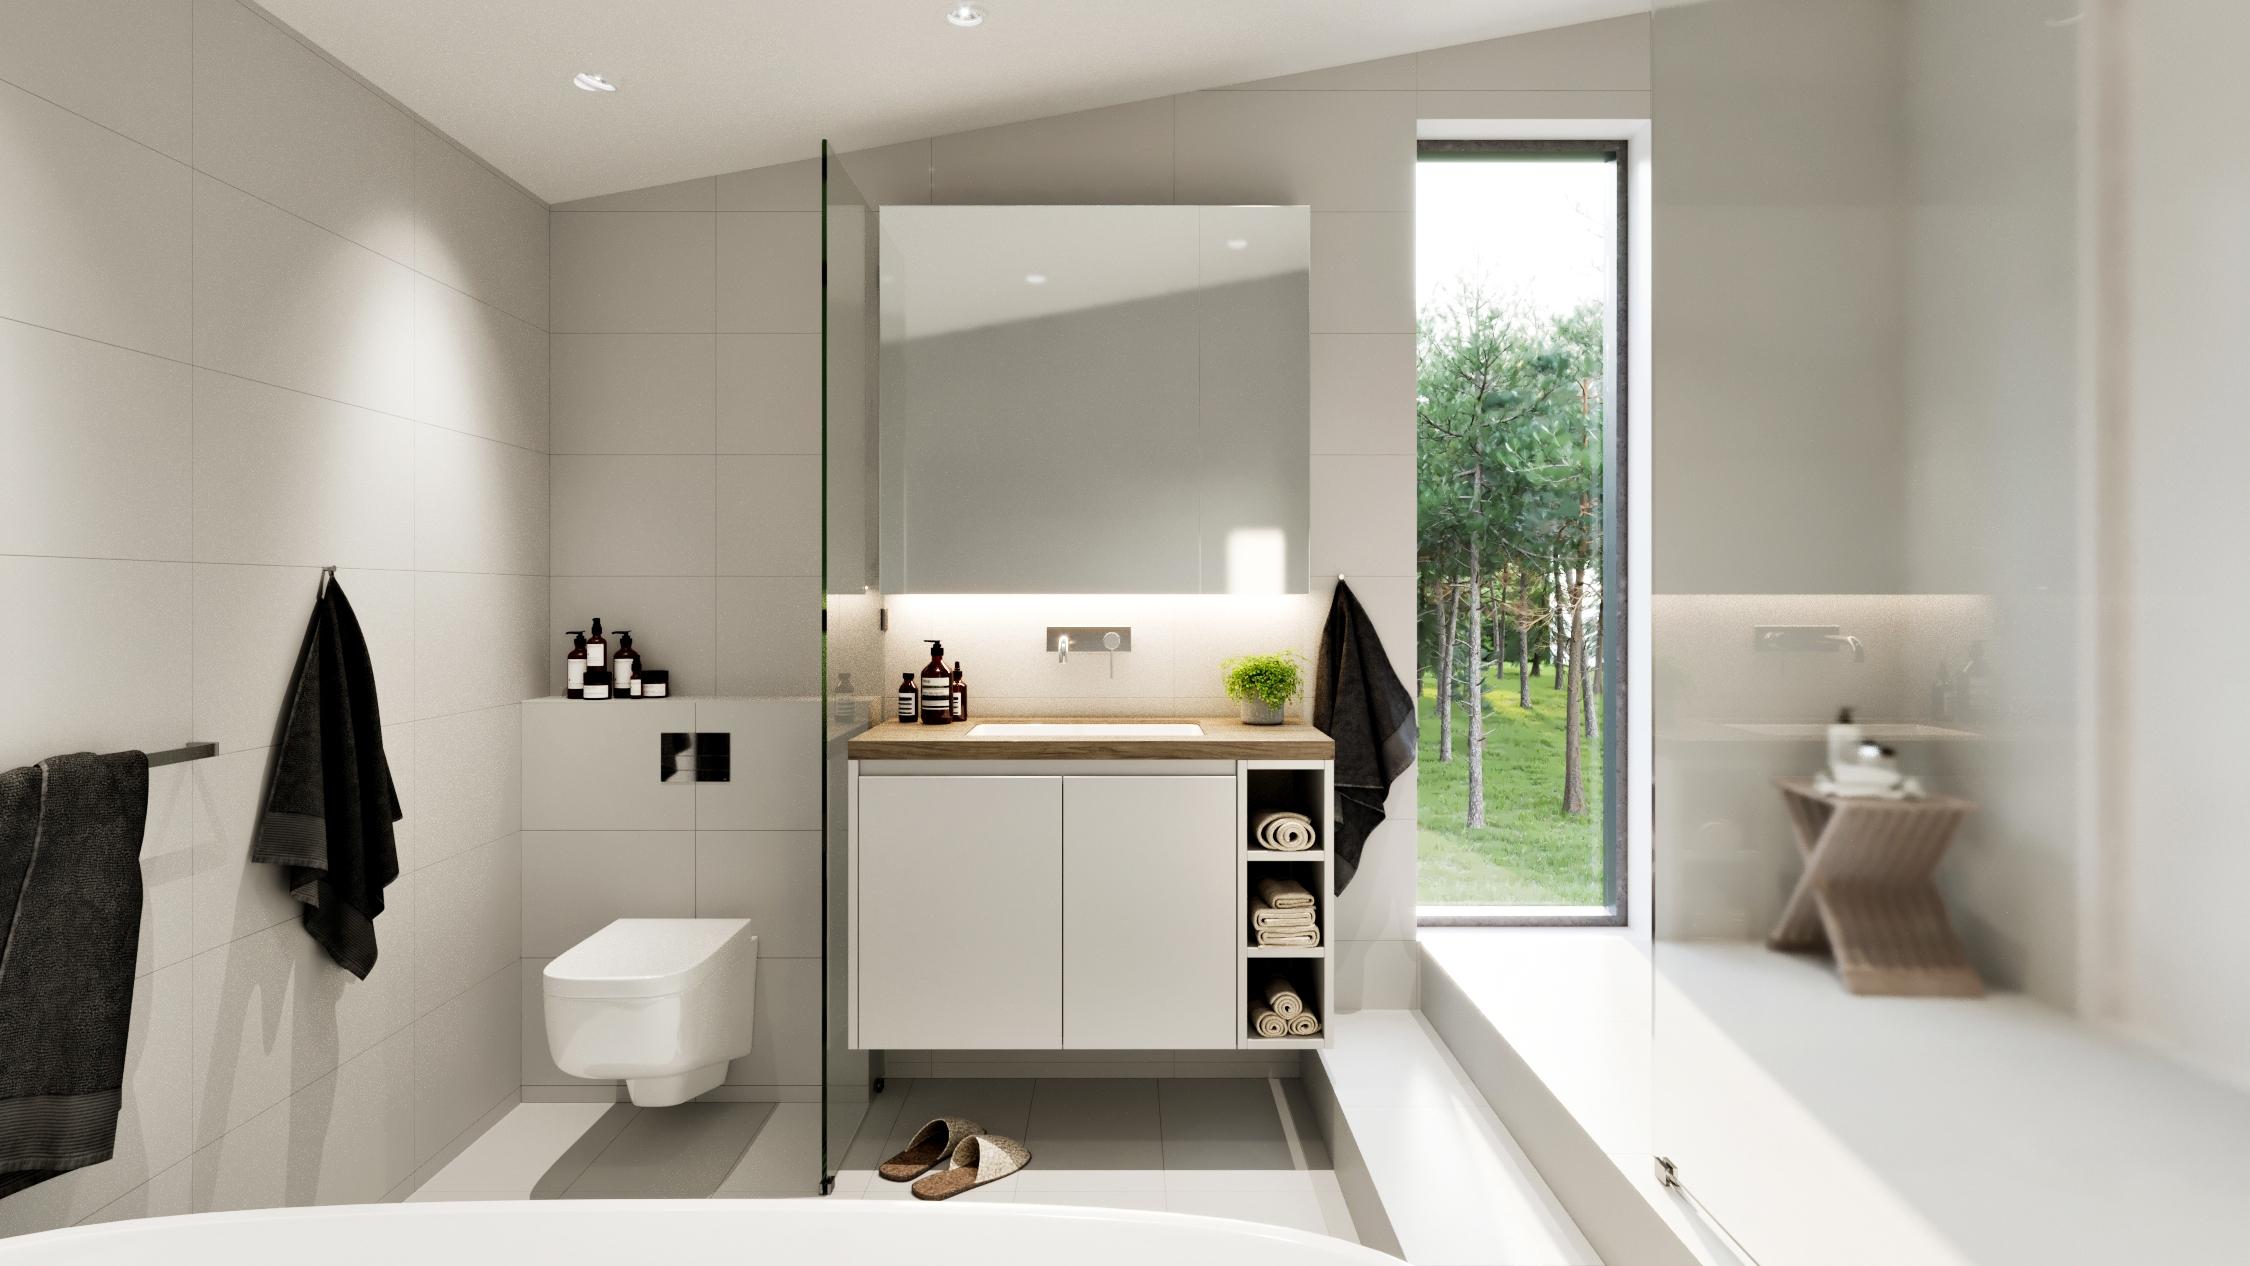 ssr-sunrise-bathroom-01.jpg